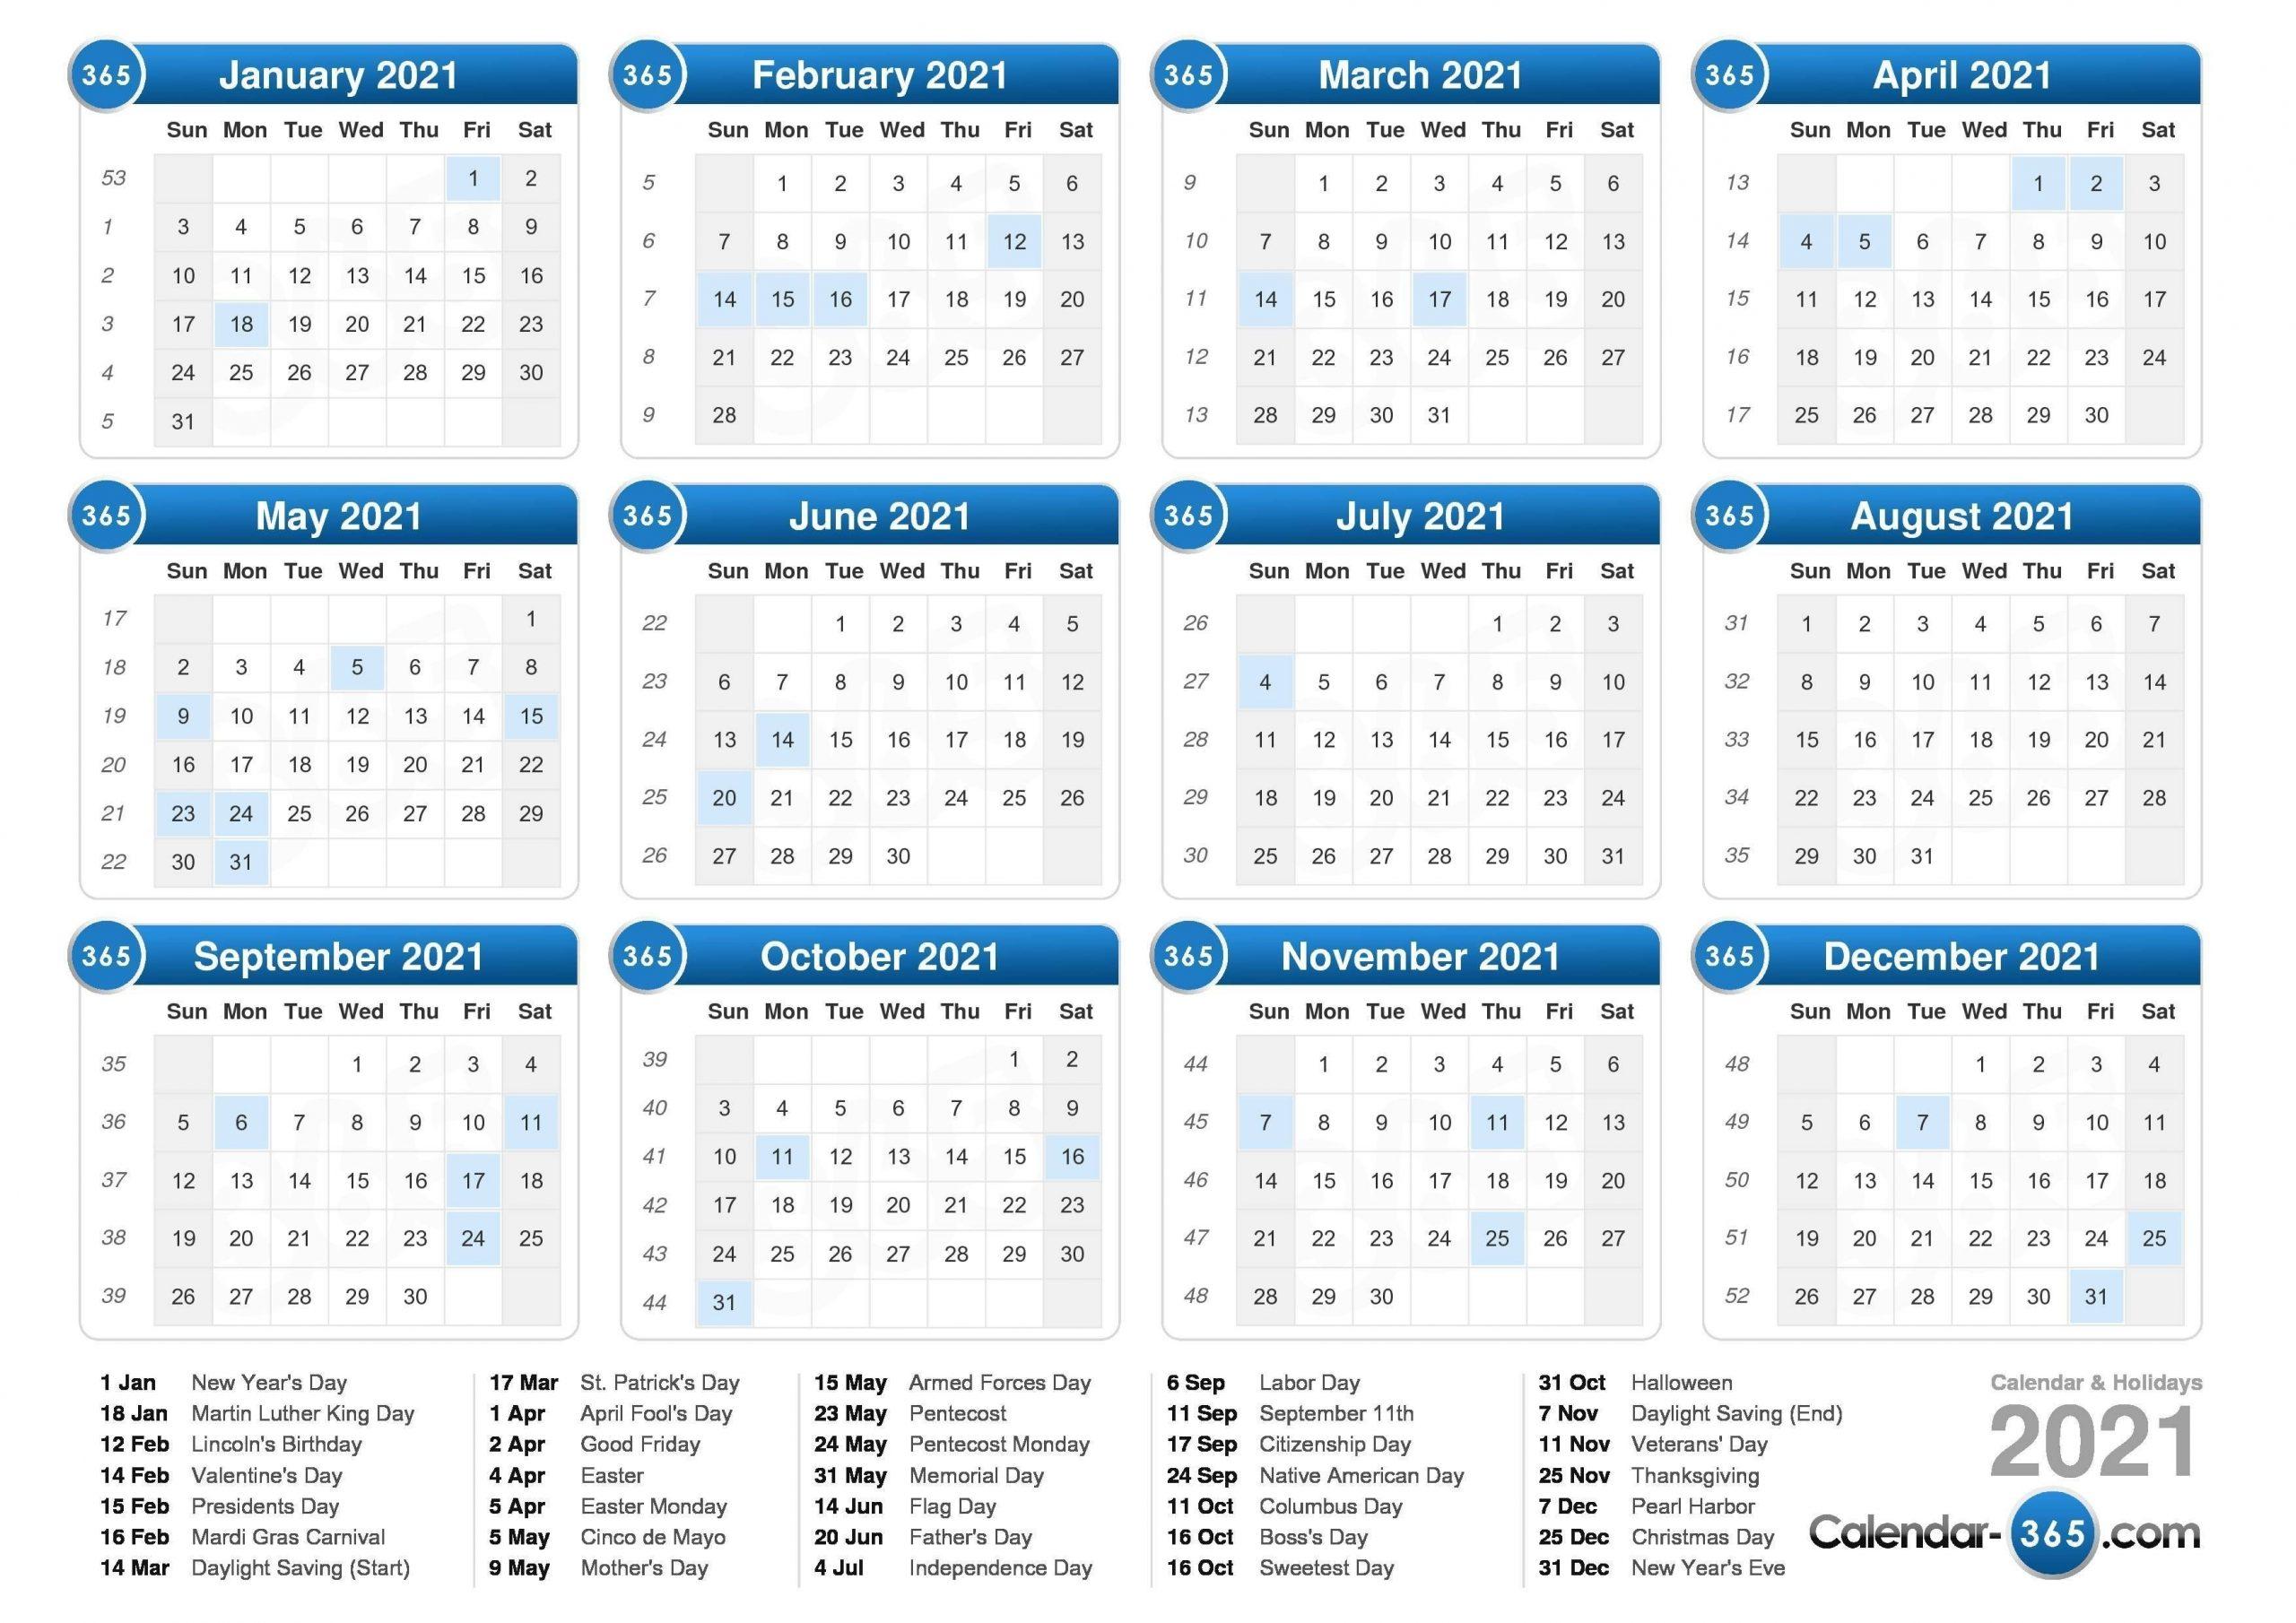 Pin By Free Printable Calendar On My Saves | Calendar Printables, Printable Calendar Template